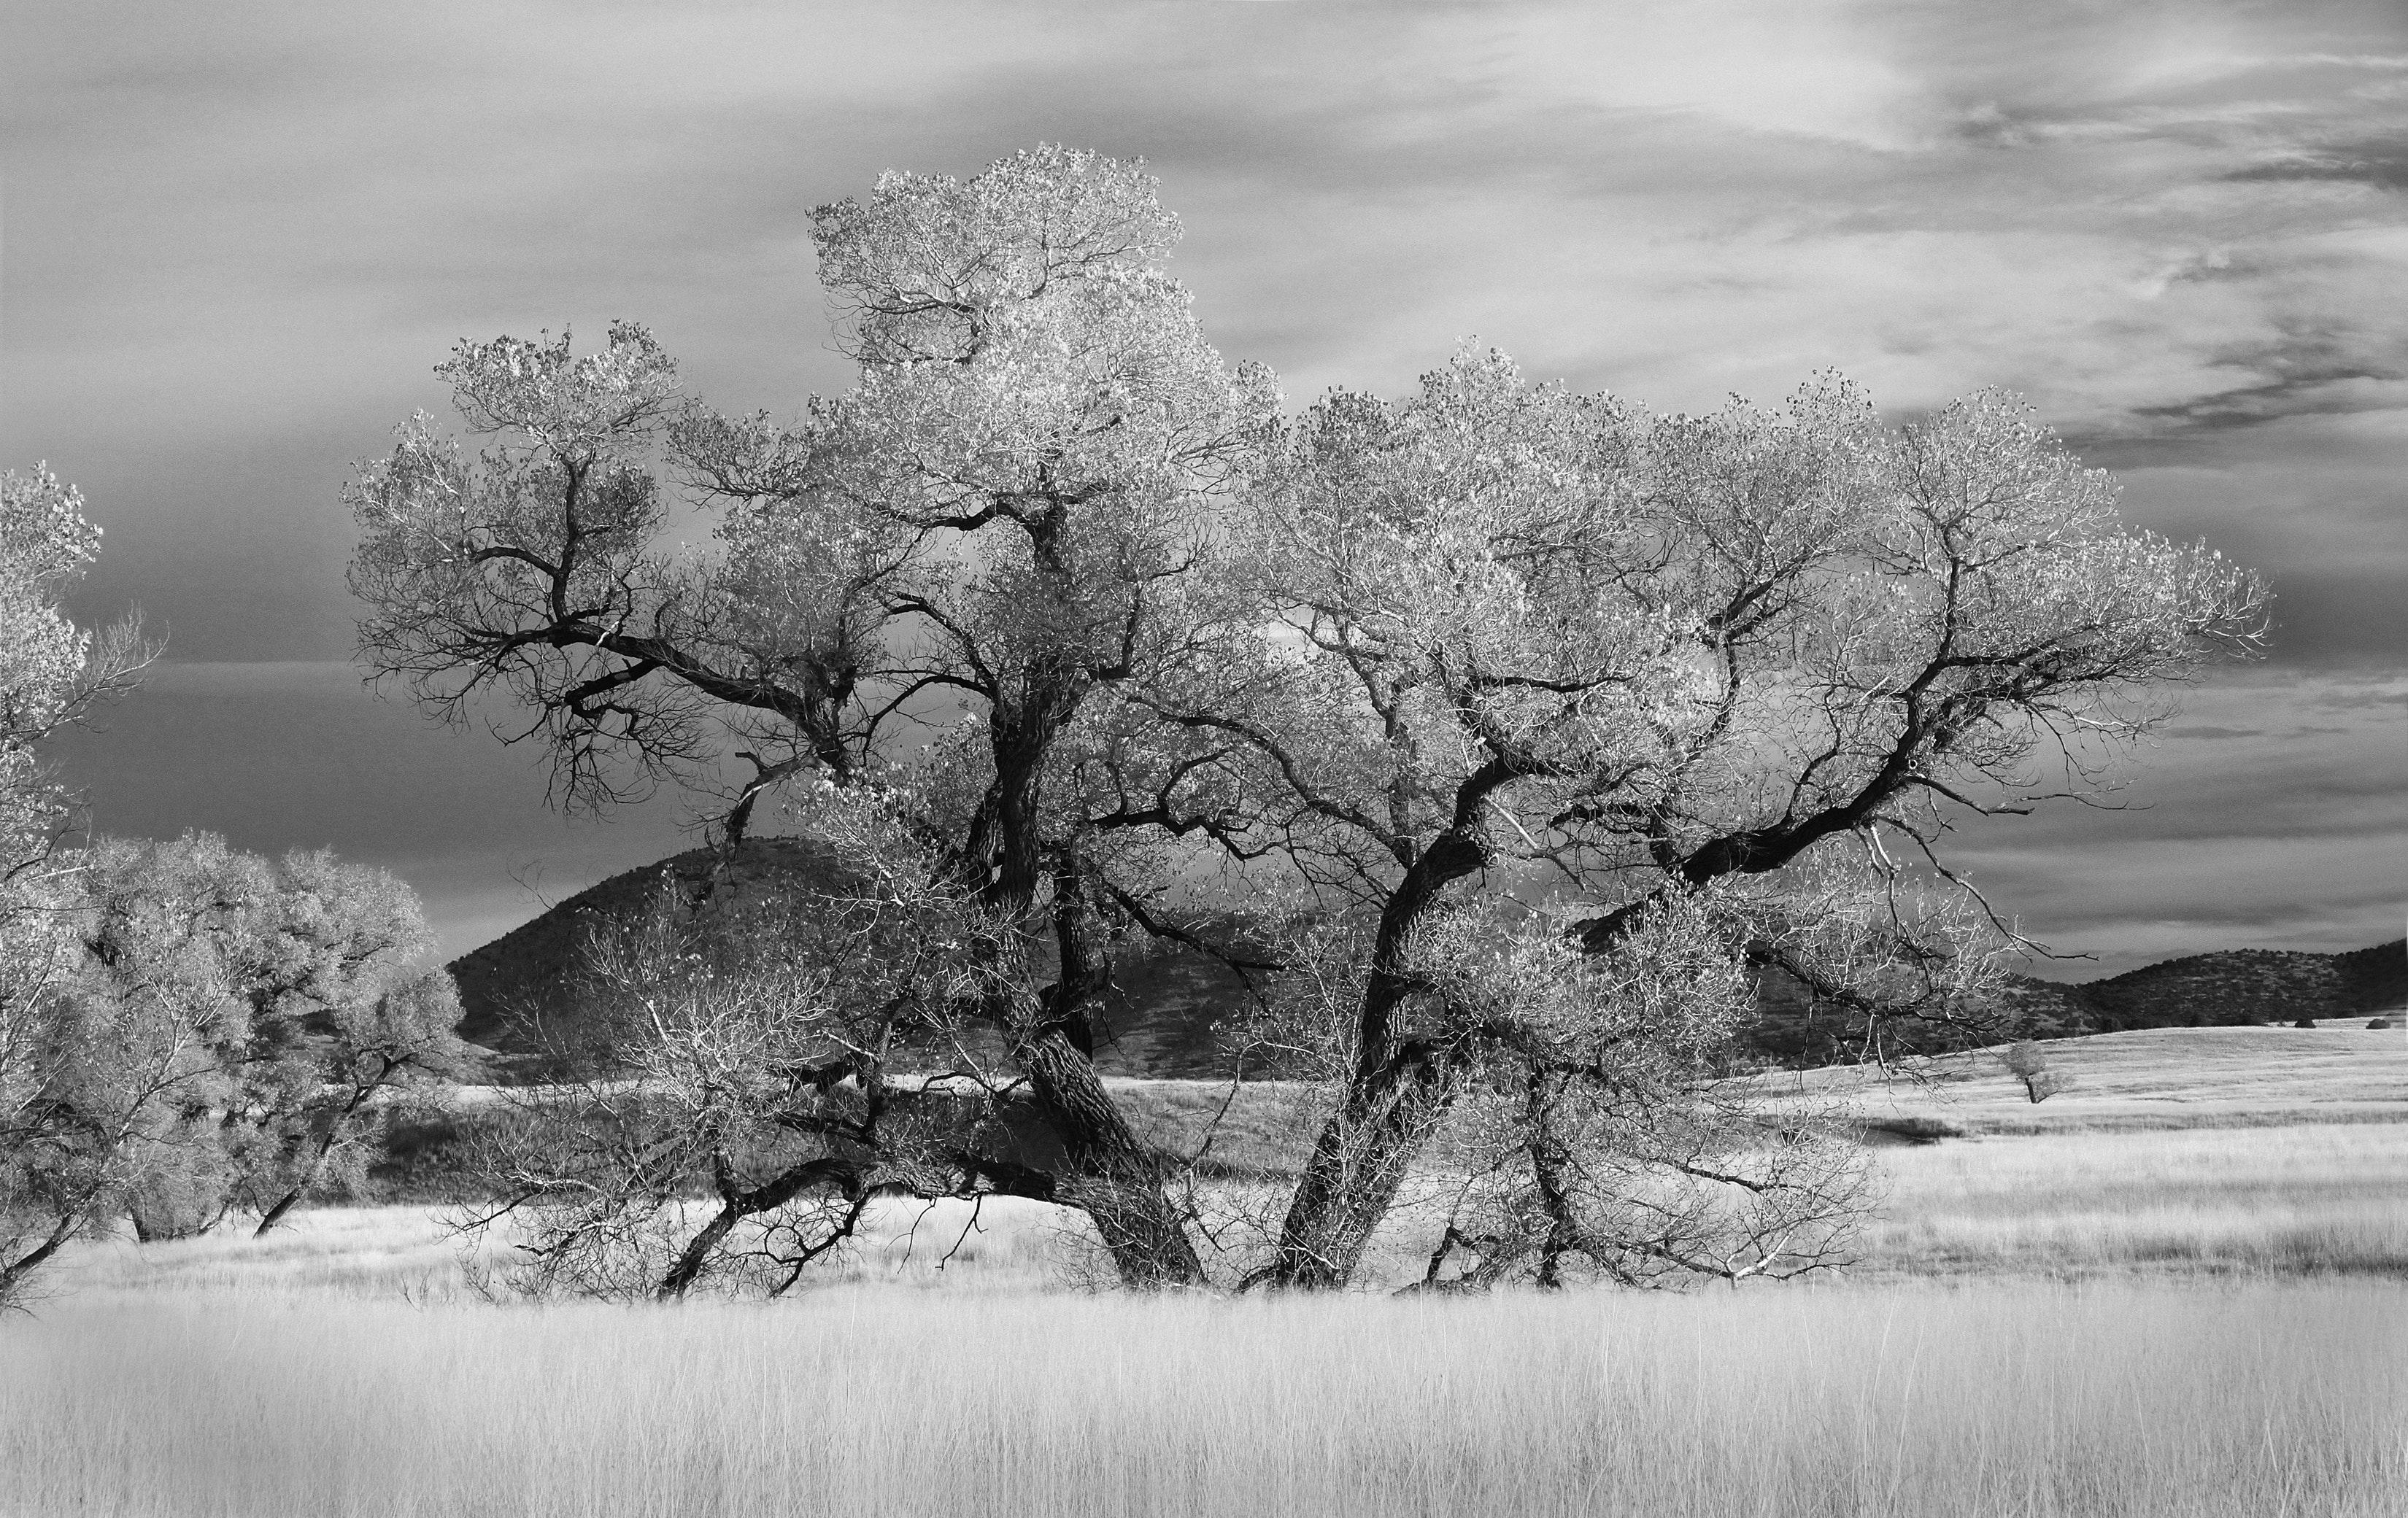 Graysclae of tree near grass photo